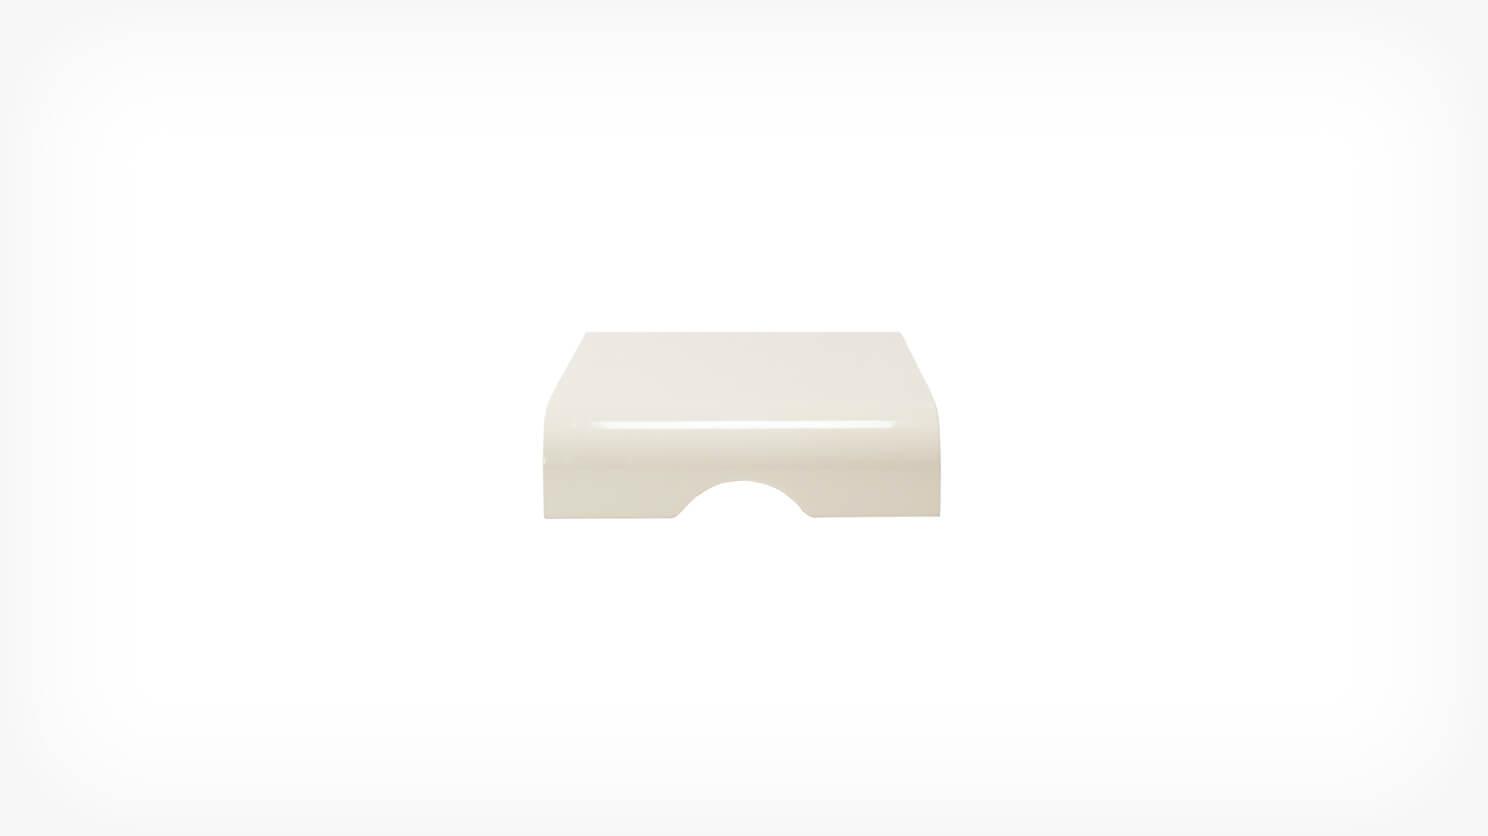 3020 101 1 03 tray ottoman tray onyx side view